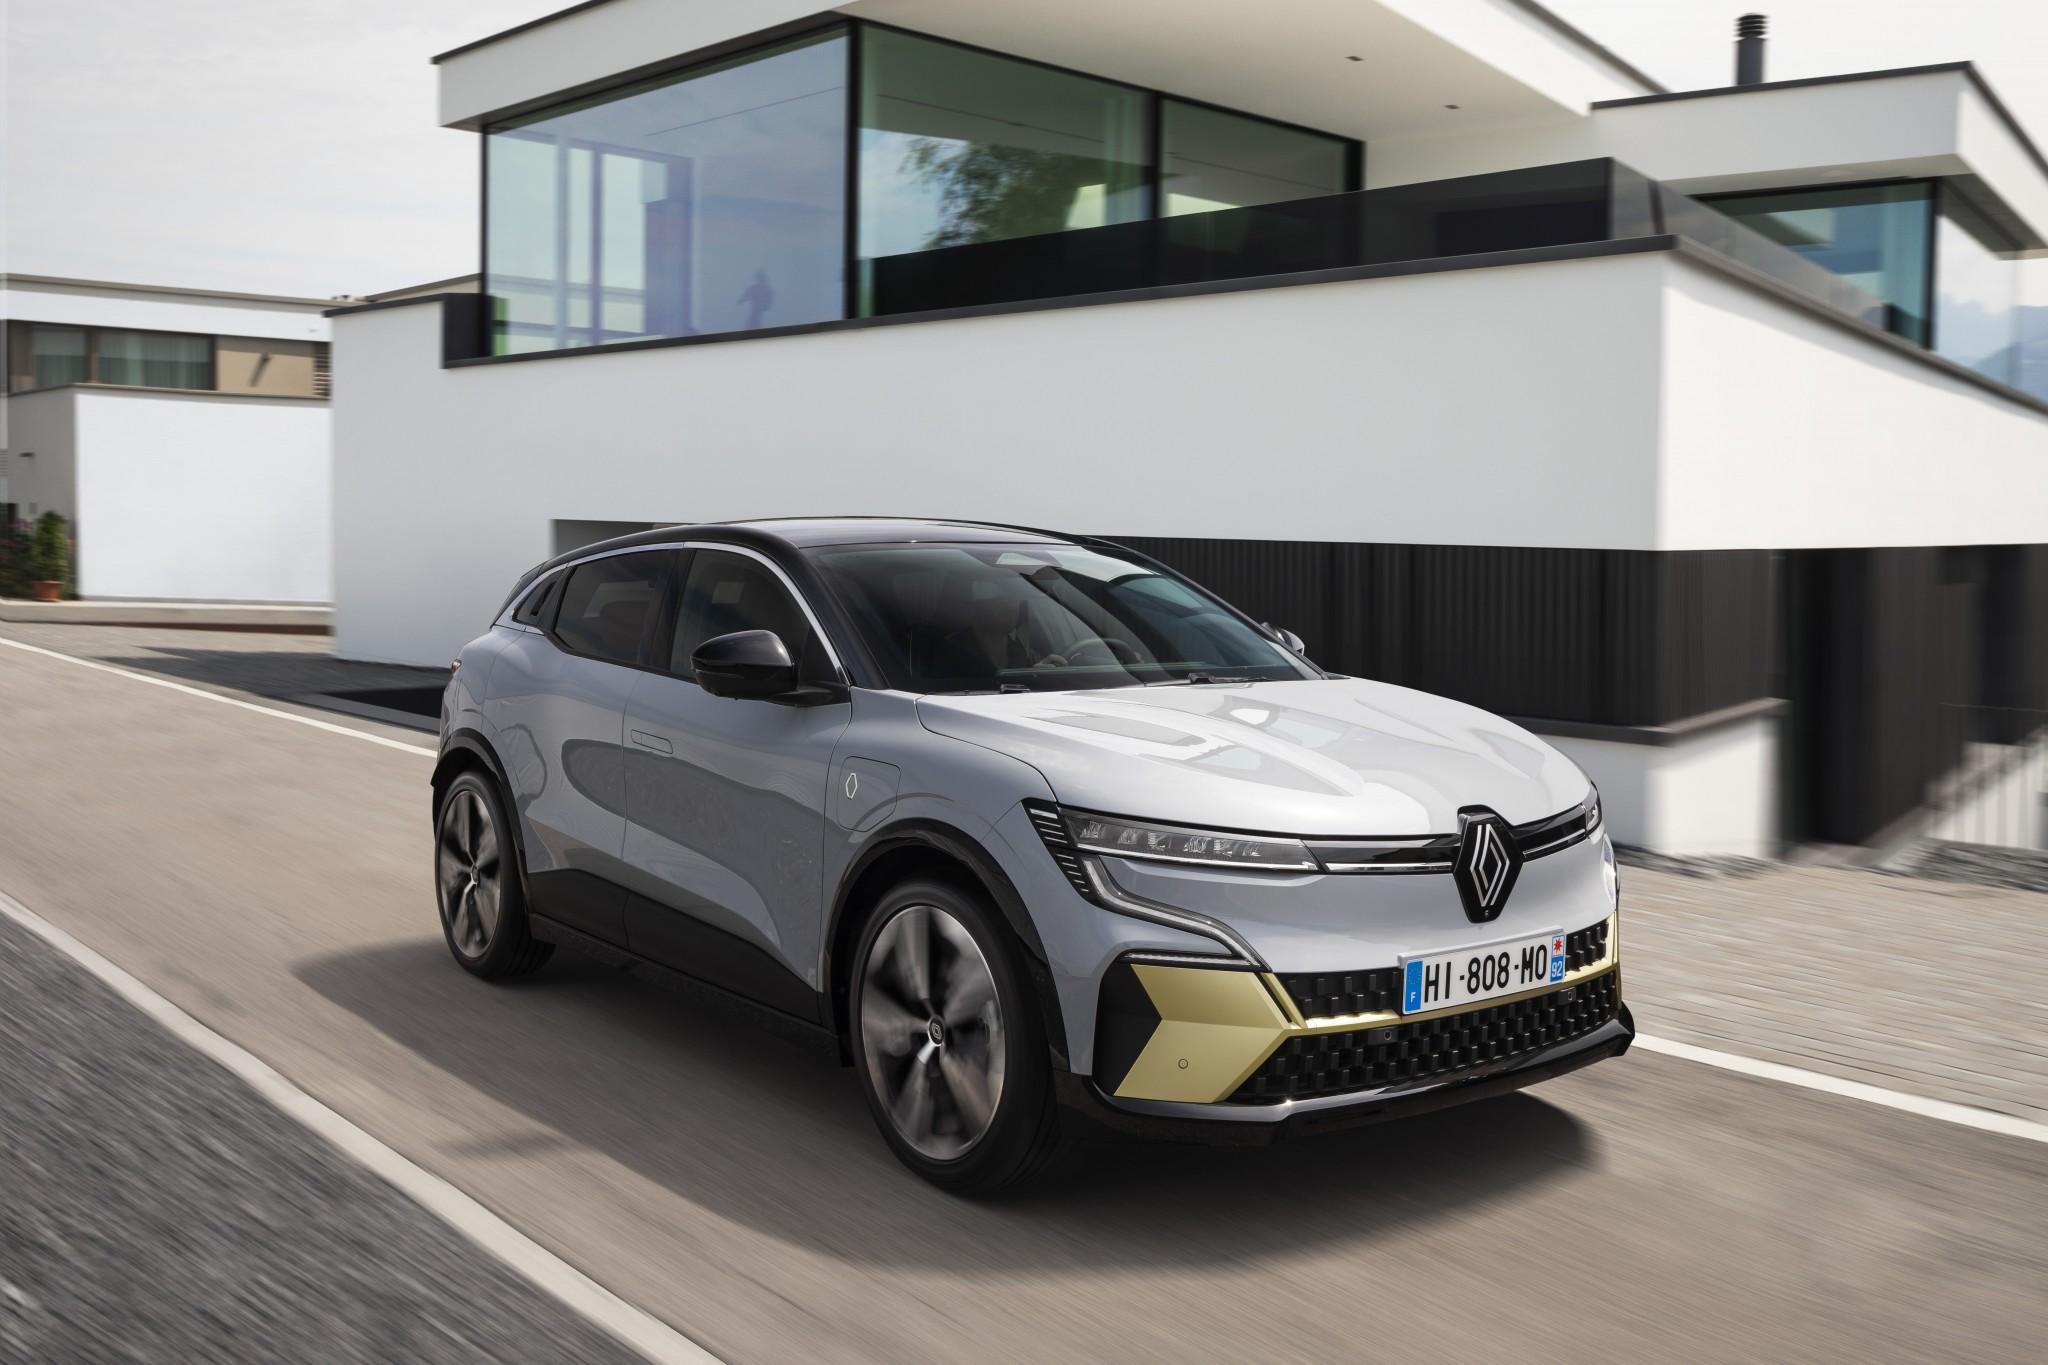 2021 - New Renault Mgane E-TECH Electric - Urban